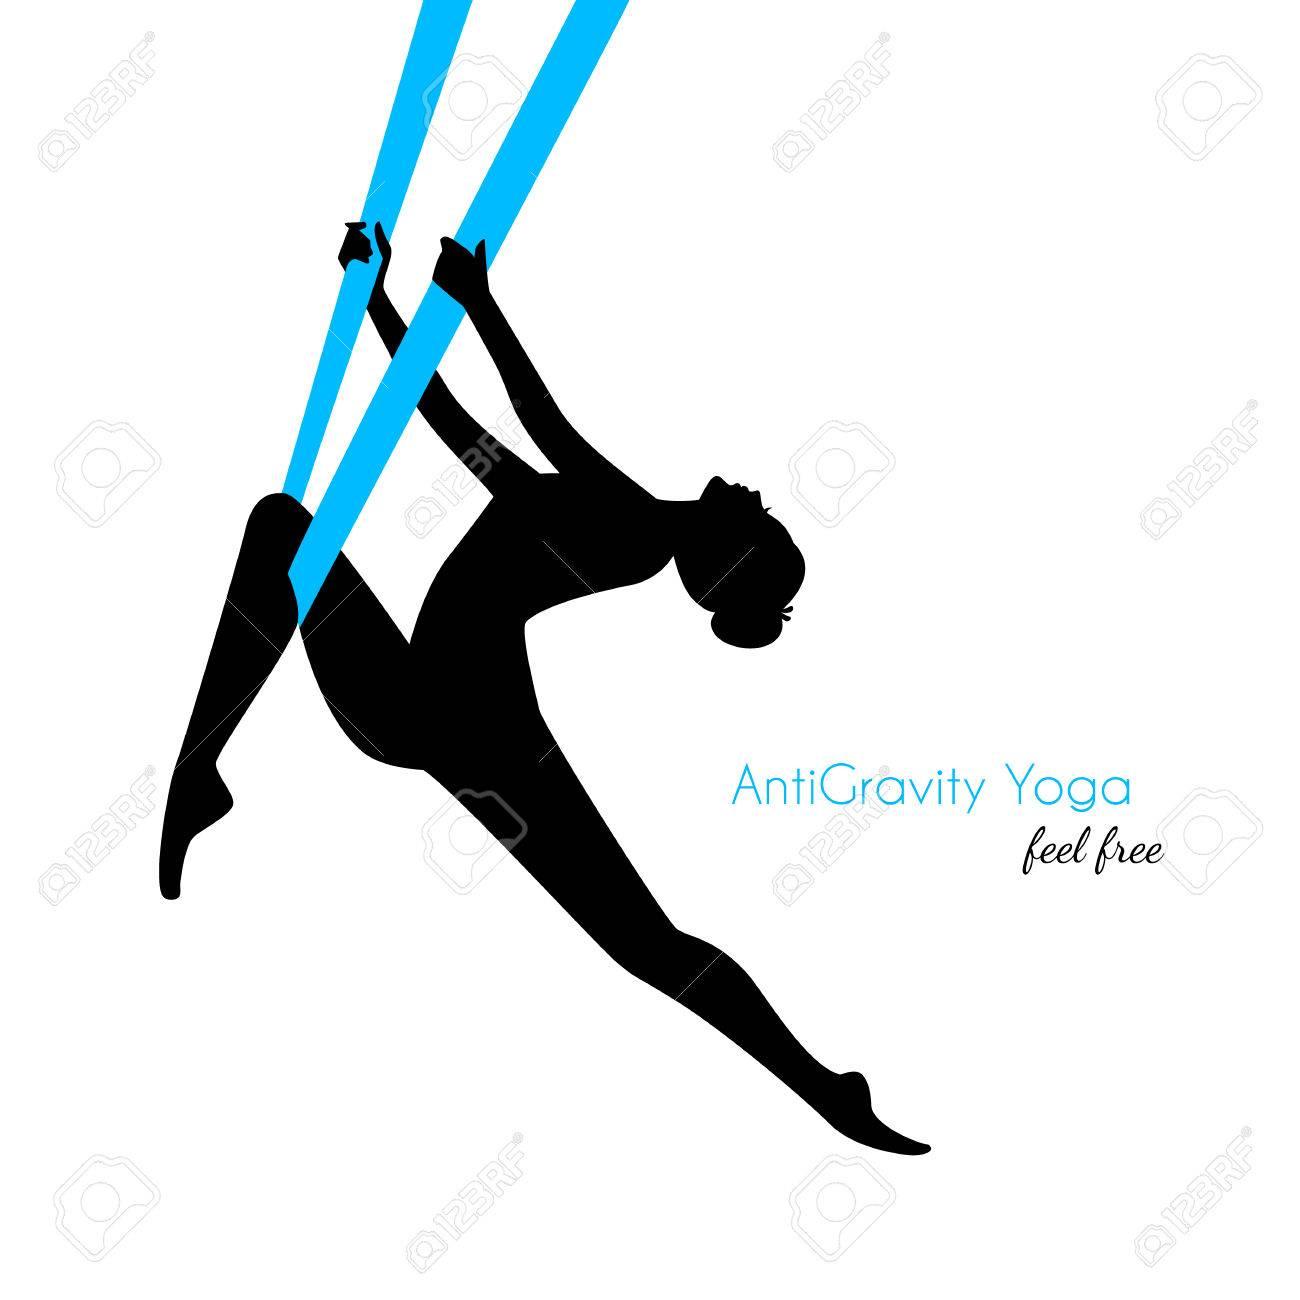 Vector illustration of Anti-gravity yoga poses woman silhouette - 35850765